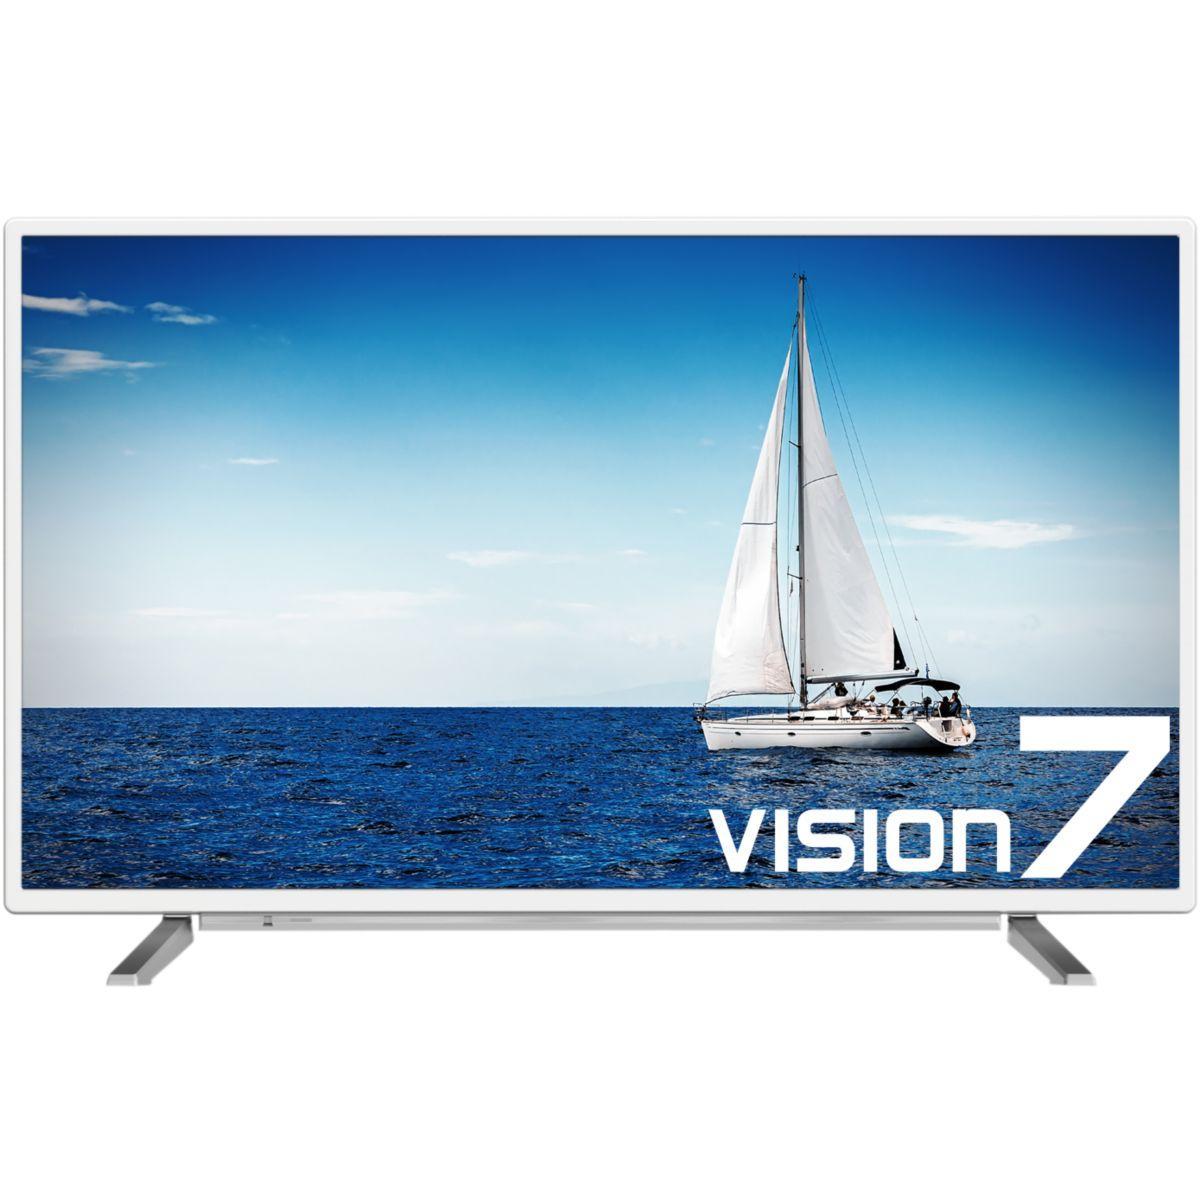 Tv grundig 40vlx7730wp (photo)